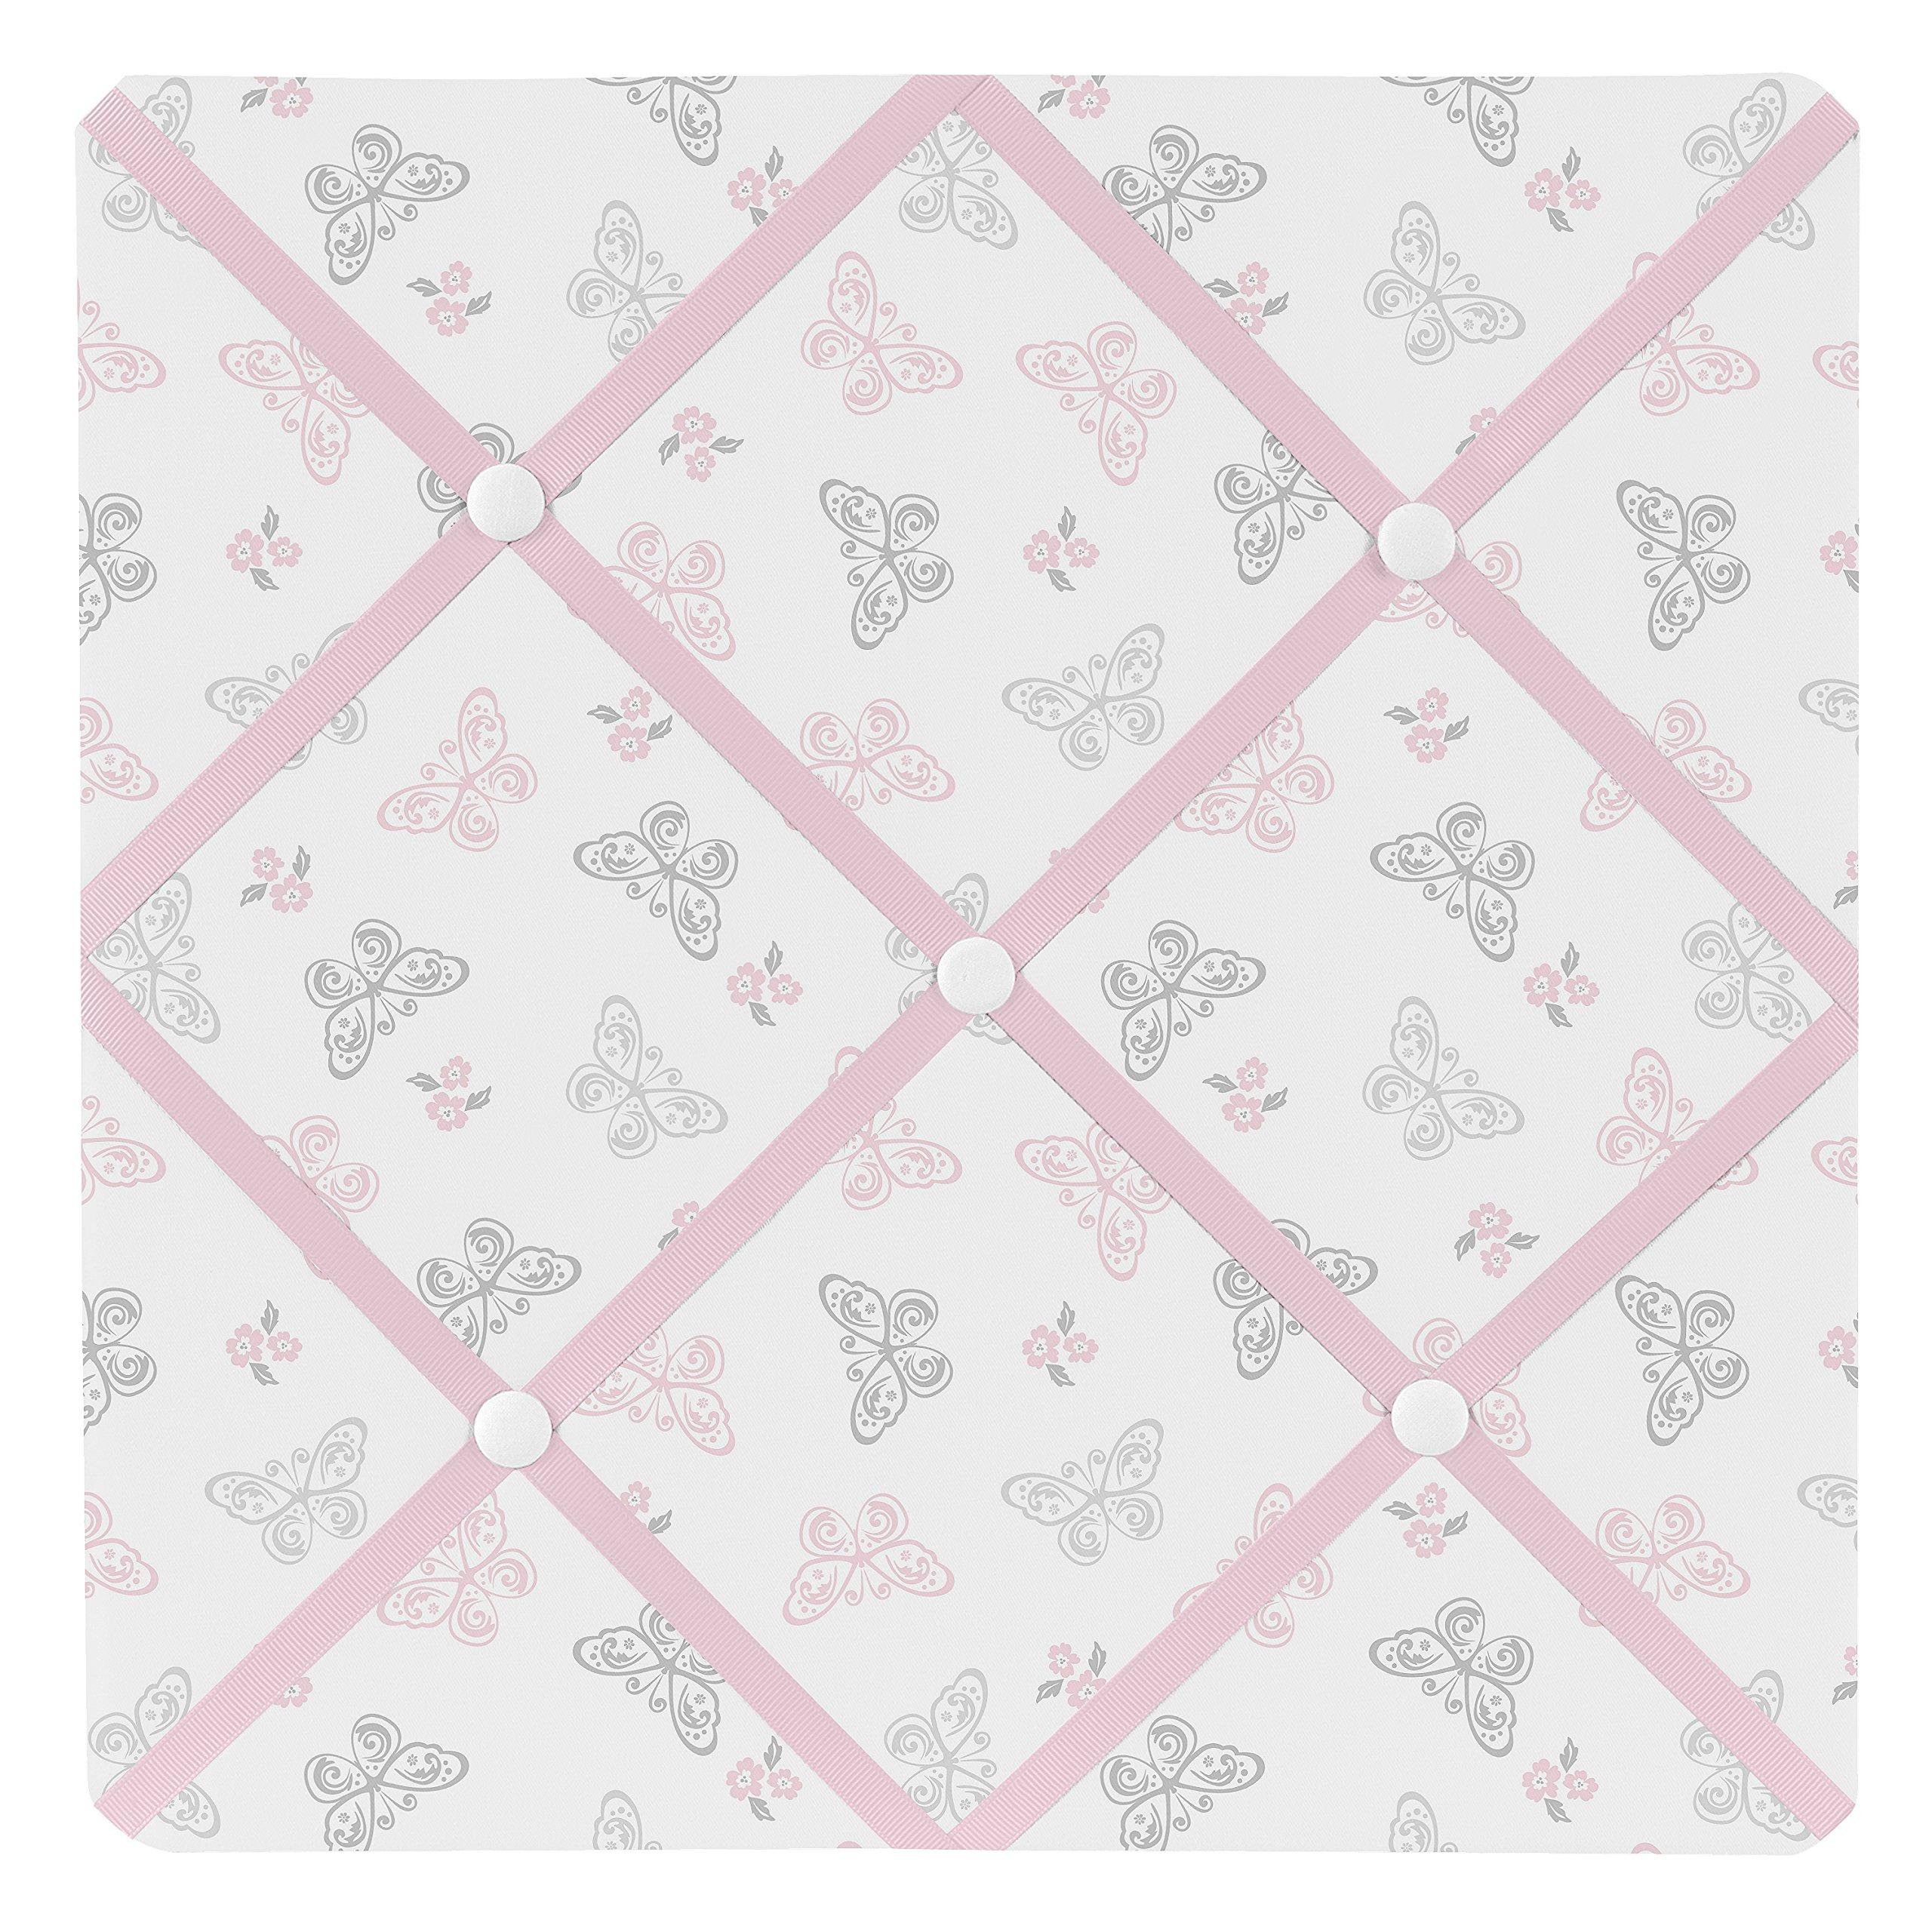 Sweet Jojo Designs Pink, Gray and White Shabby Chic Alexa Damask Butterfly Fabric Memory/Memo Photo Bulletin Board